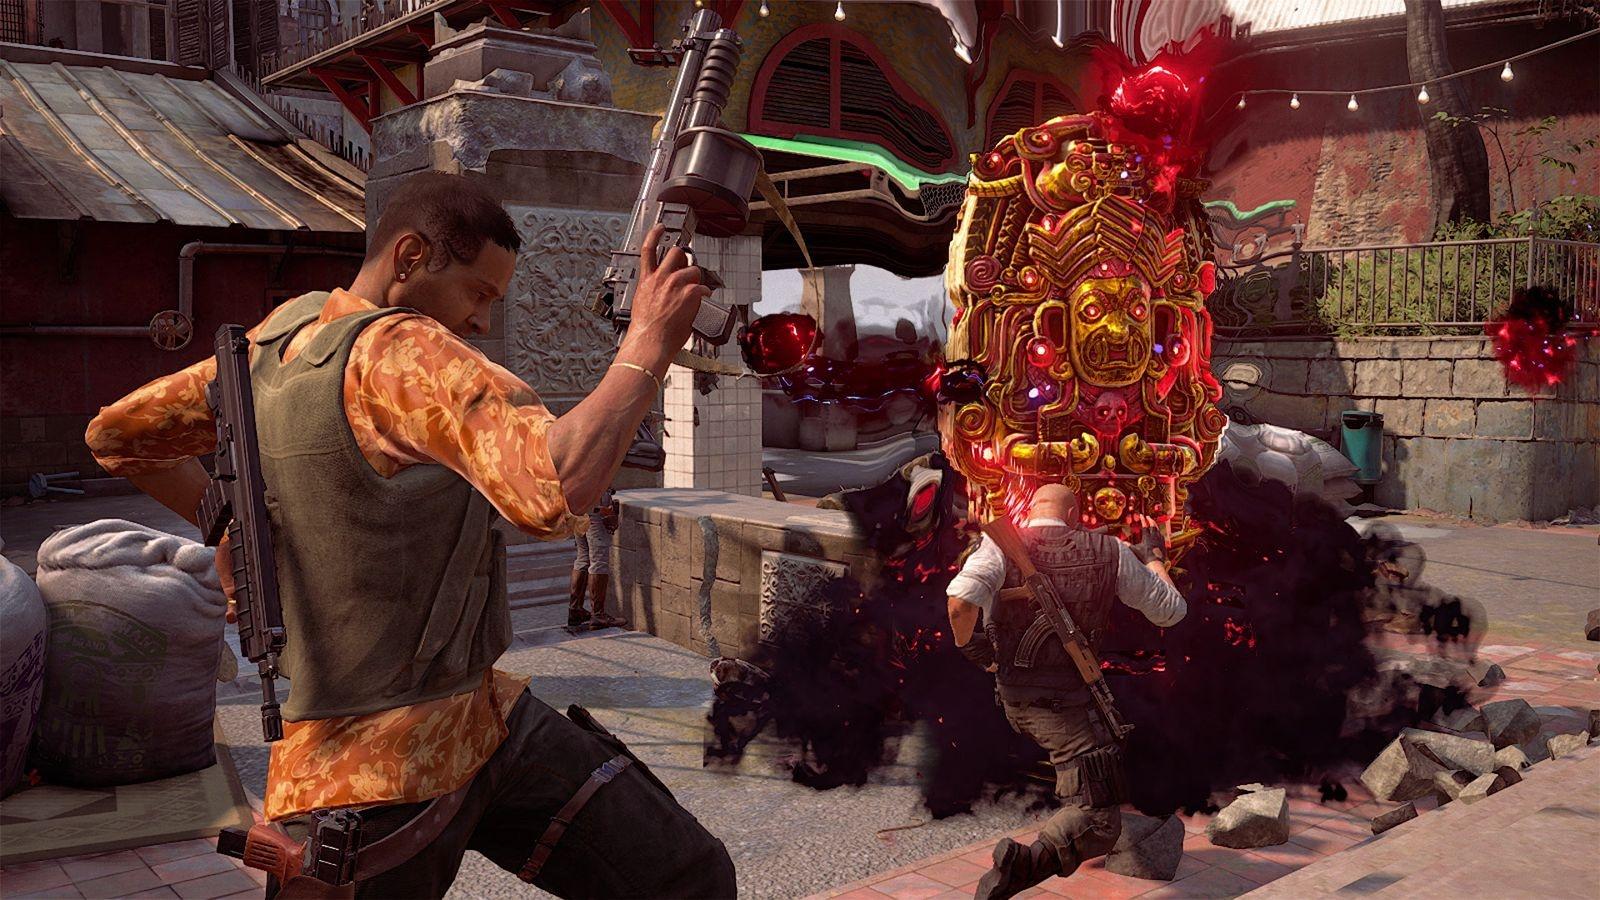 Uncharted 4: beta multiplayer - hands on